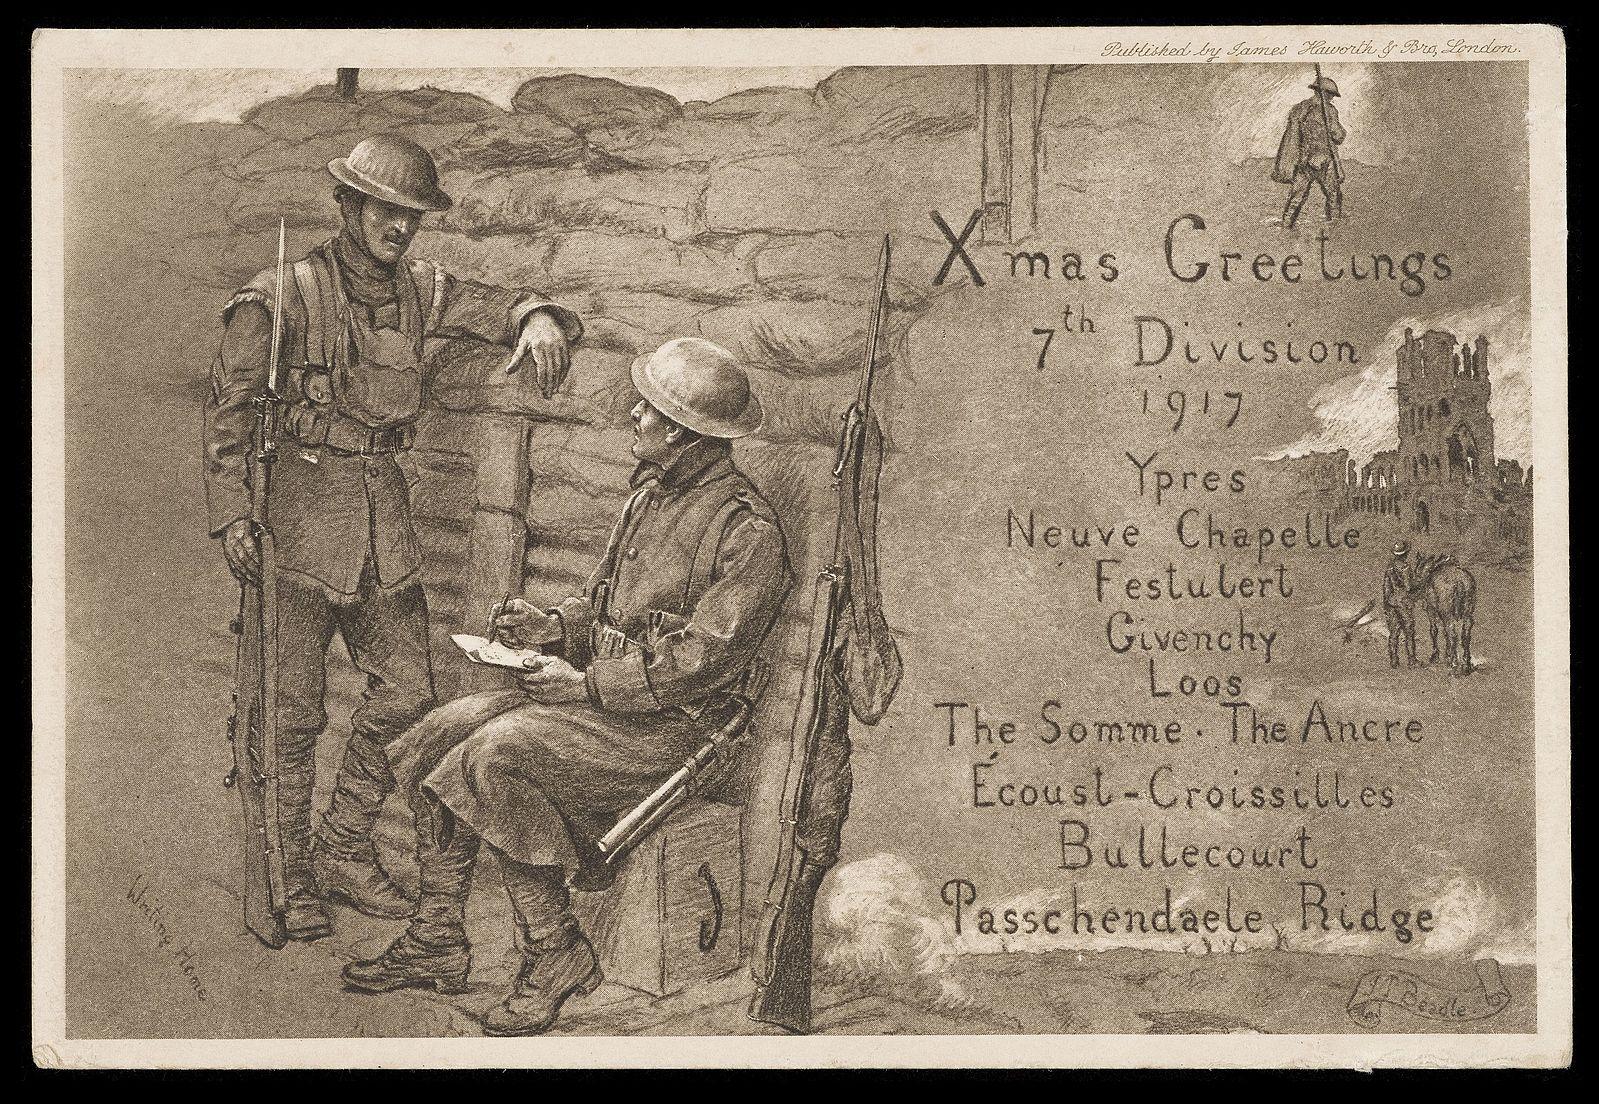 Christmas Postcard - Archives and Manuscripts RAMC/1015/5, L0049548